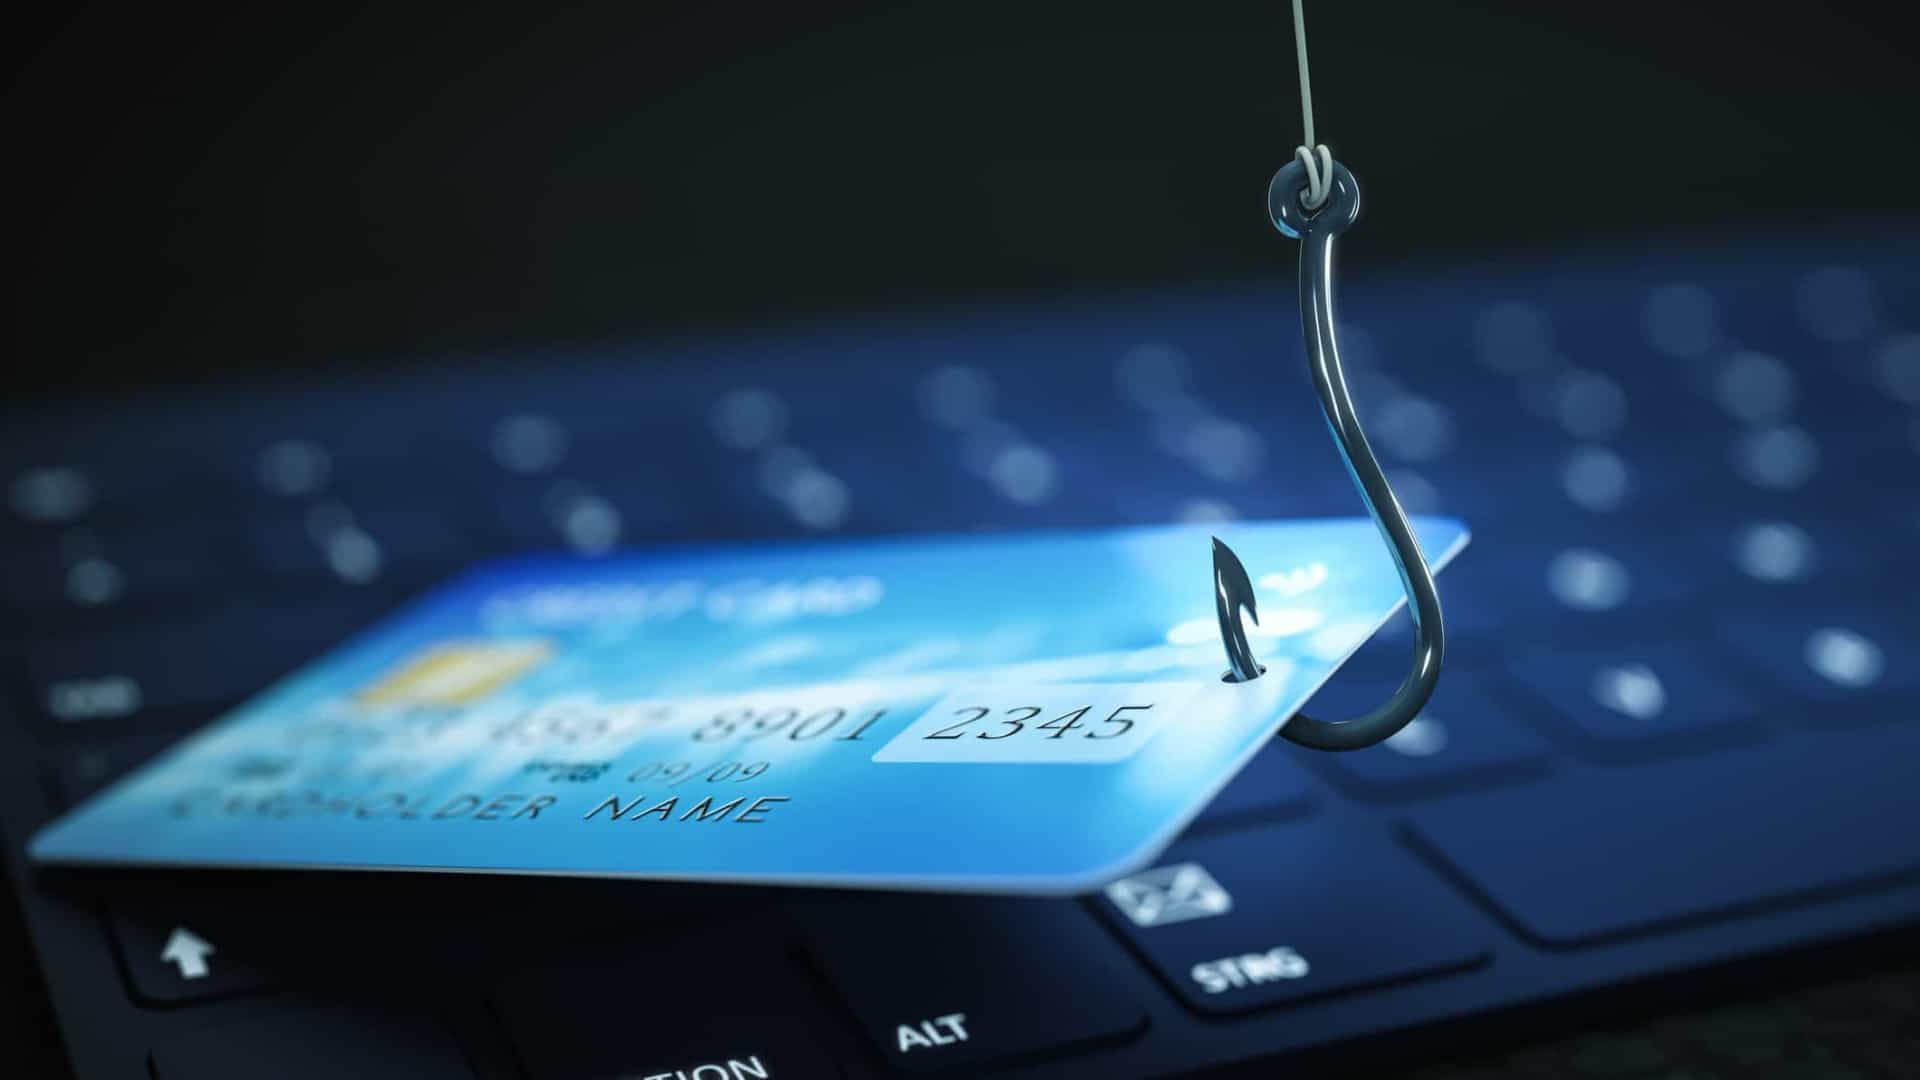 Phising cartaPhishing cartao hacker online compras pc ransomwareo hacker online compras pc ransomware